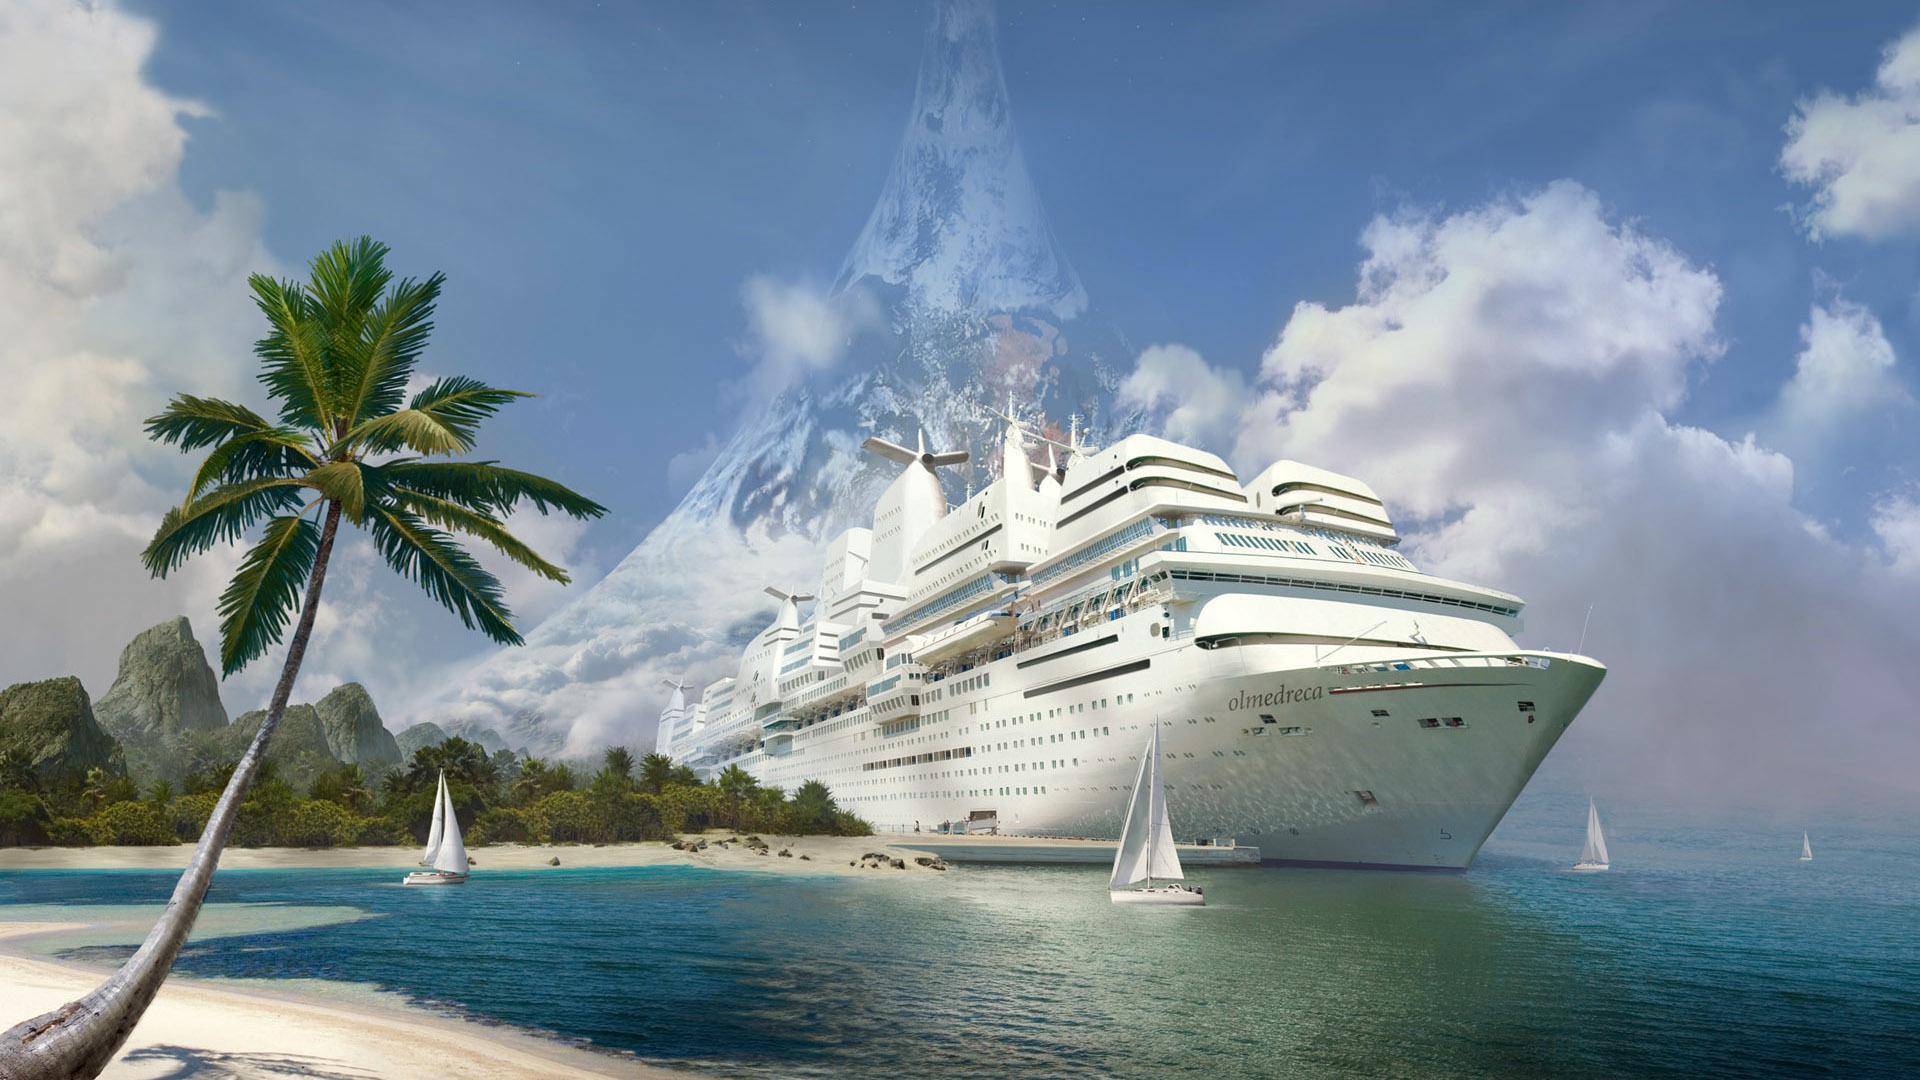 Ship Fantasy wallpapers HD quality